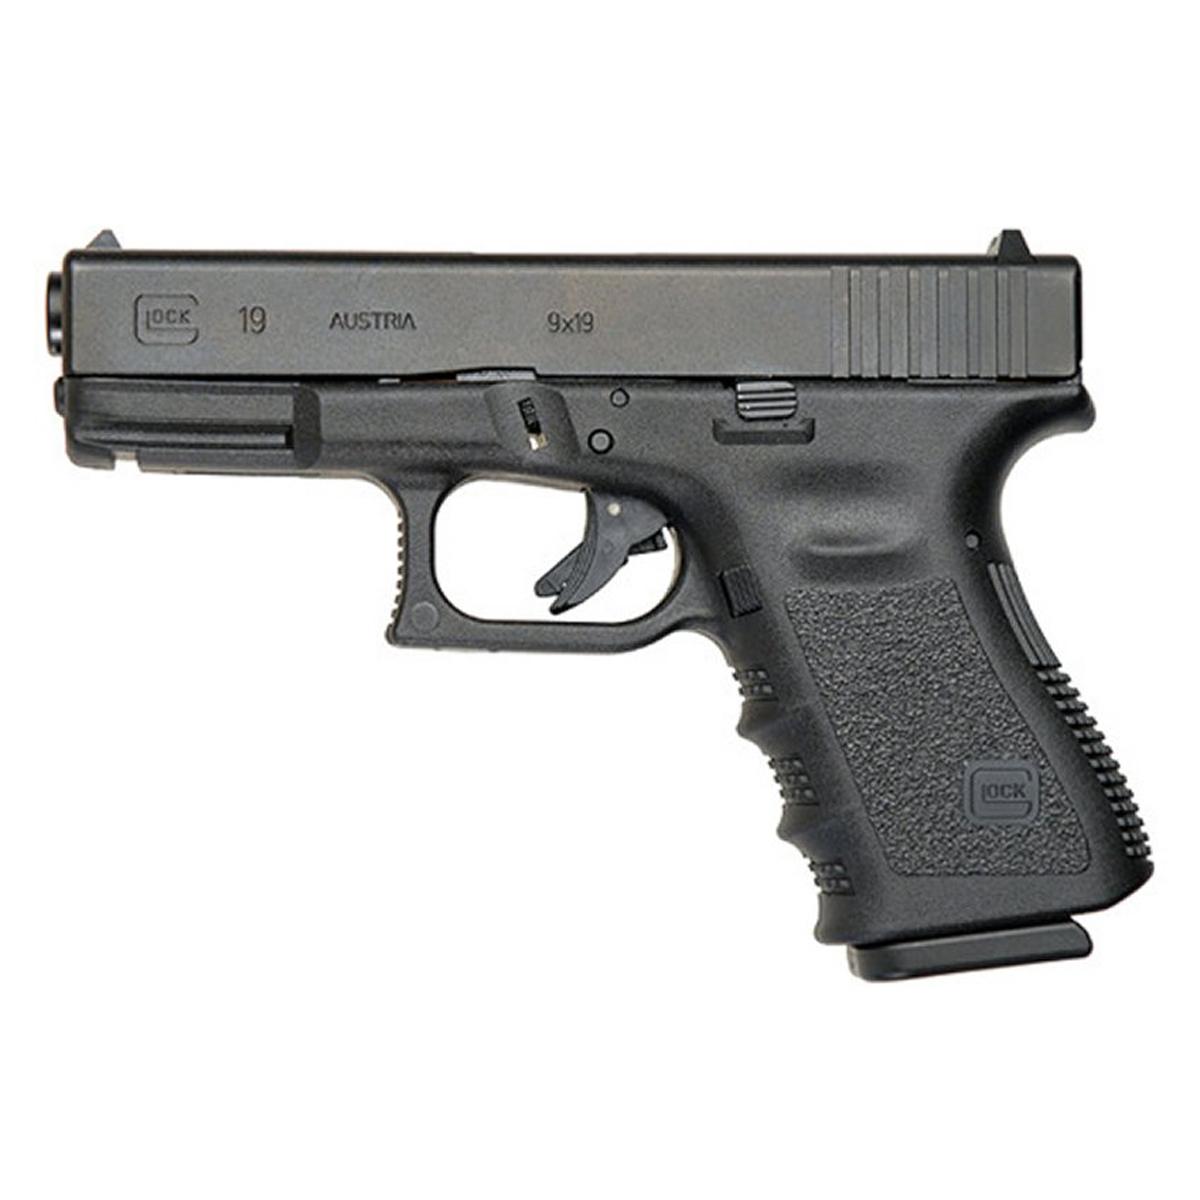 9mm Glock Clipart - Clipart Suggest  9mm Glock Clipa...